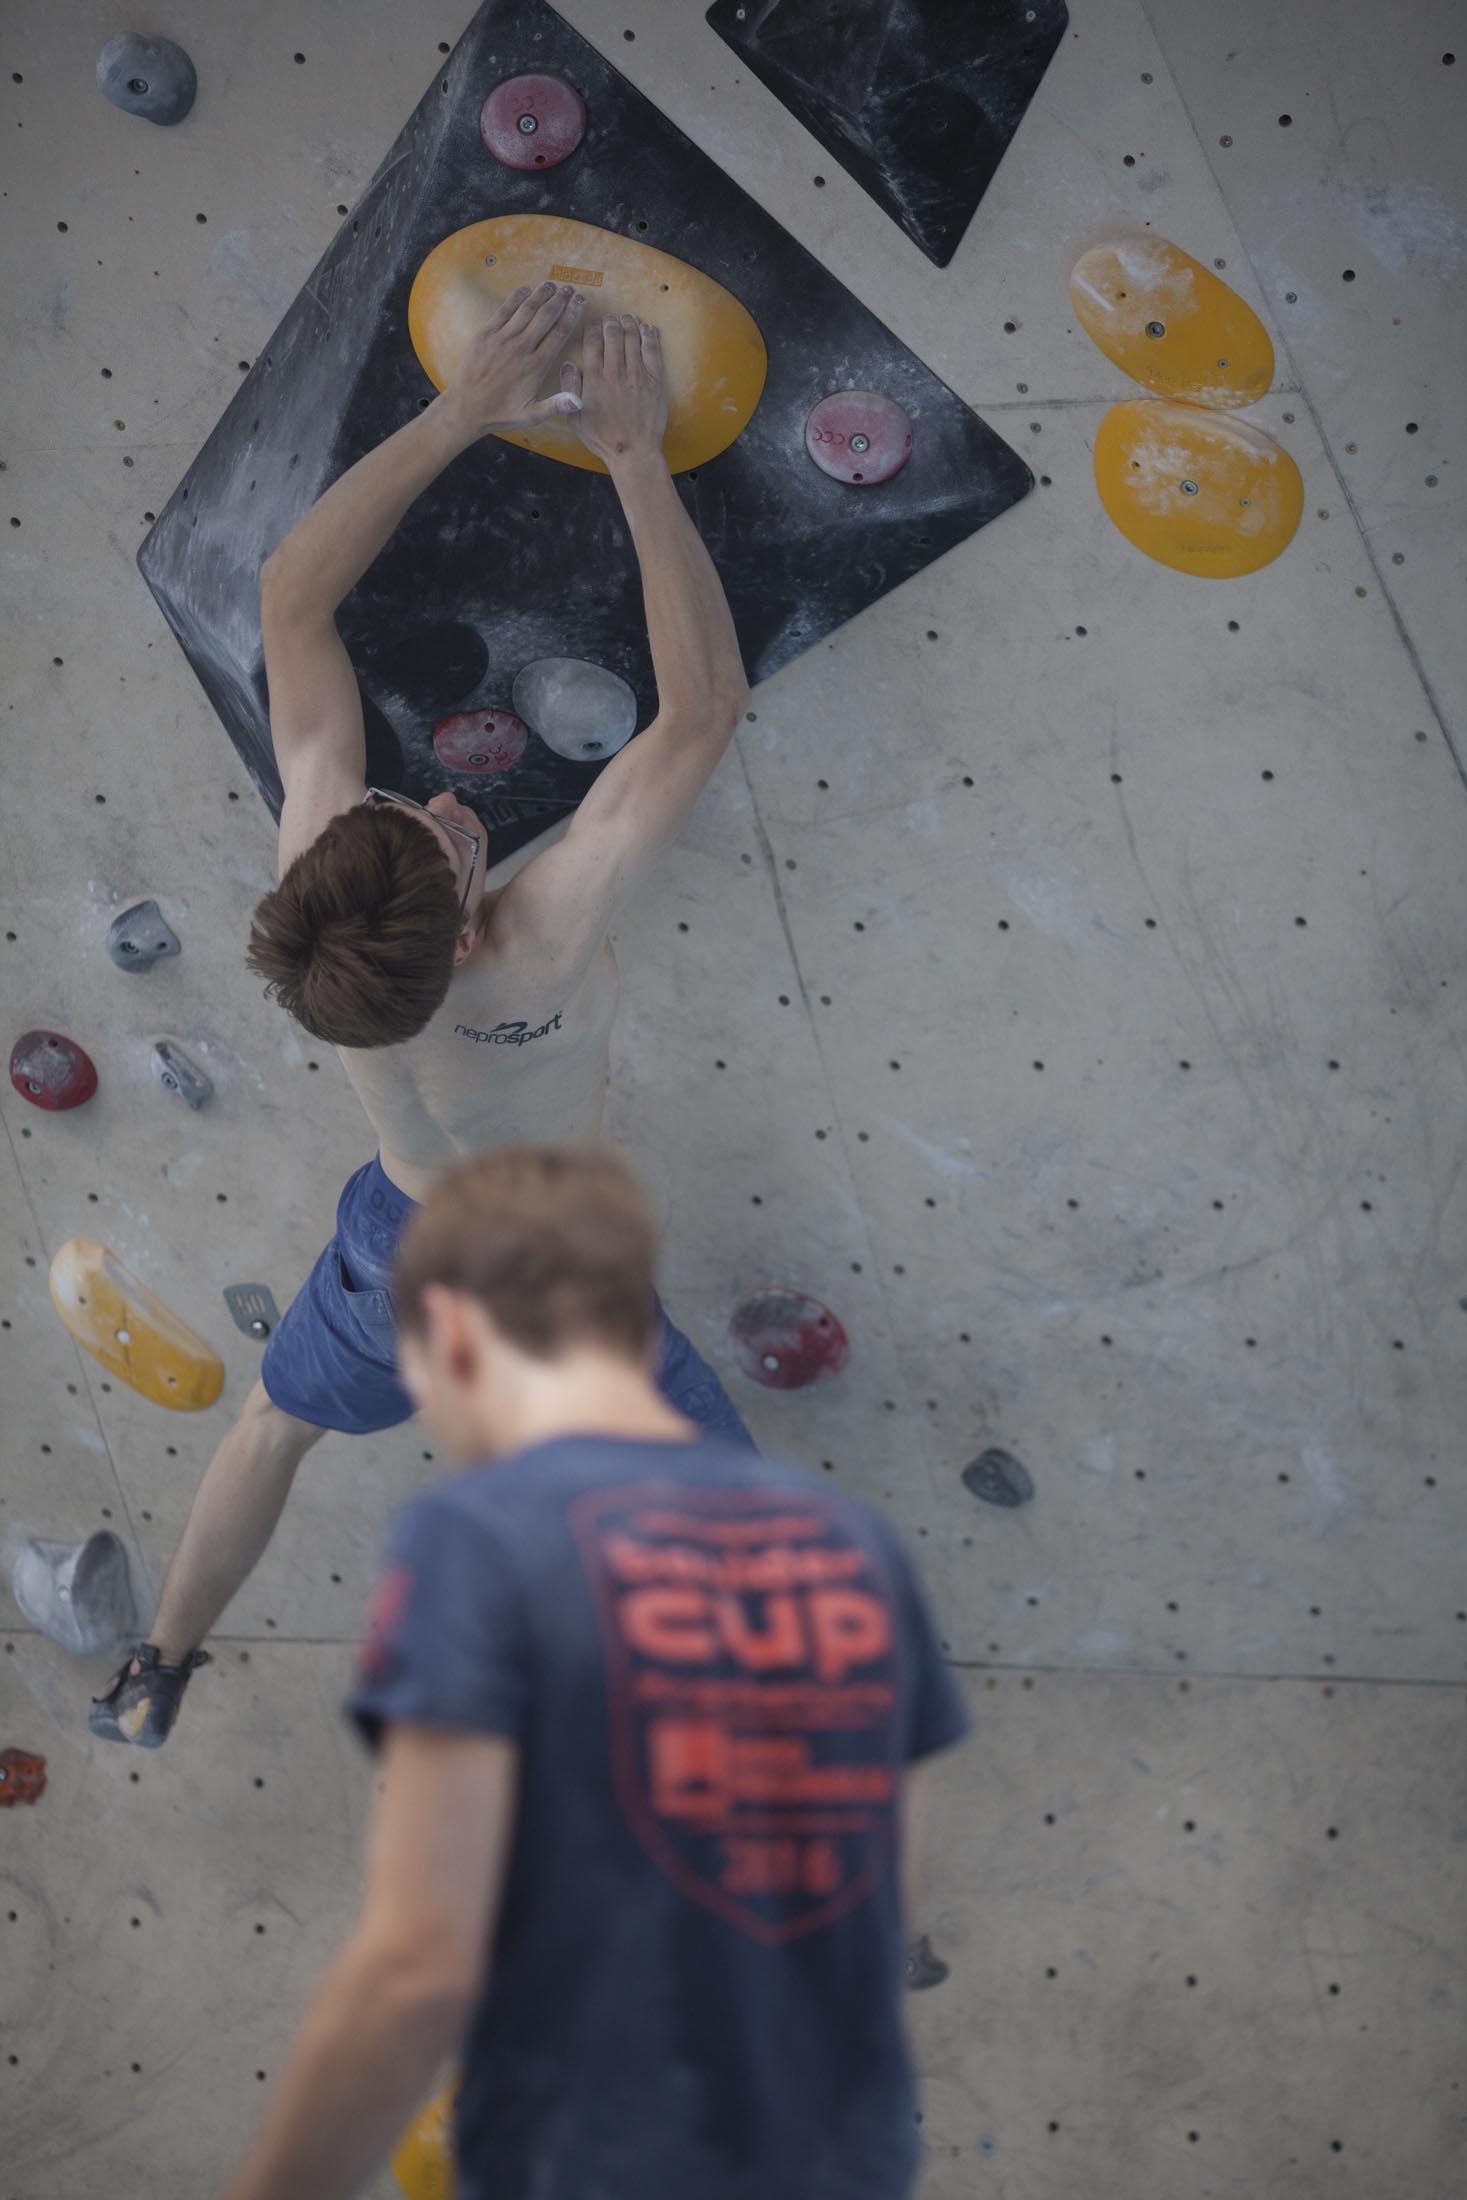 Quali, internationaler bouldercup Frankenjura 2016, BLOCKHELDEN Erlangen, Mammut, Bergfreunde.de, Boulderwettkampf07092016349